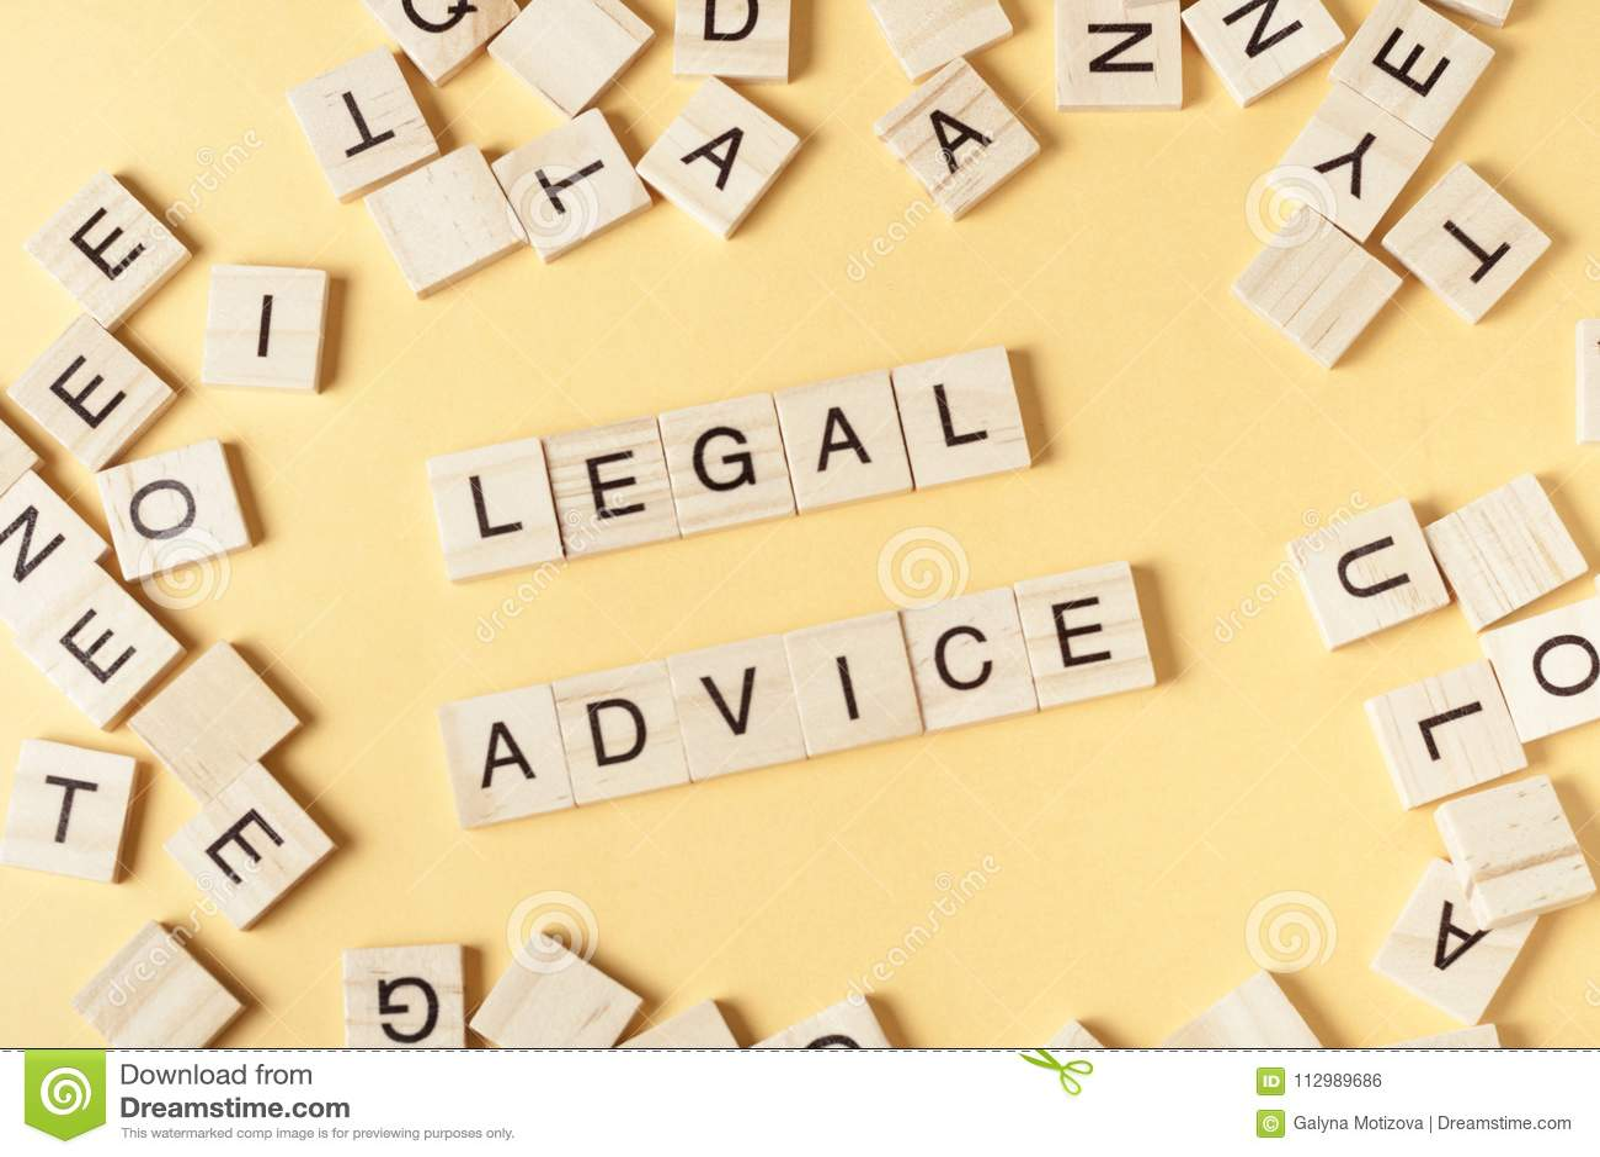 LEGAL ADVICE written on wood block. Wooden ABC.